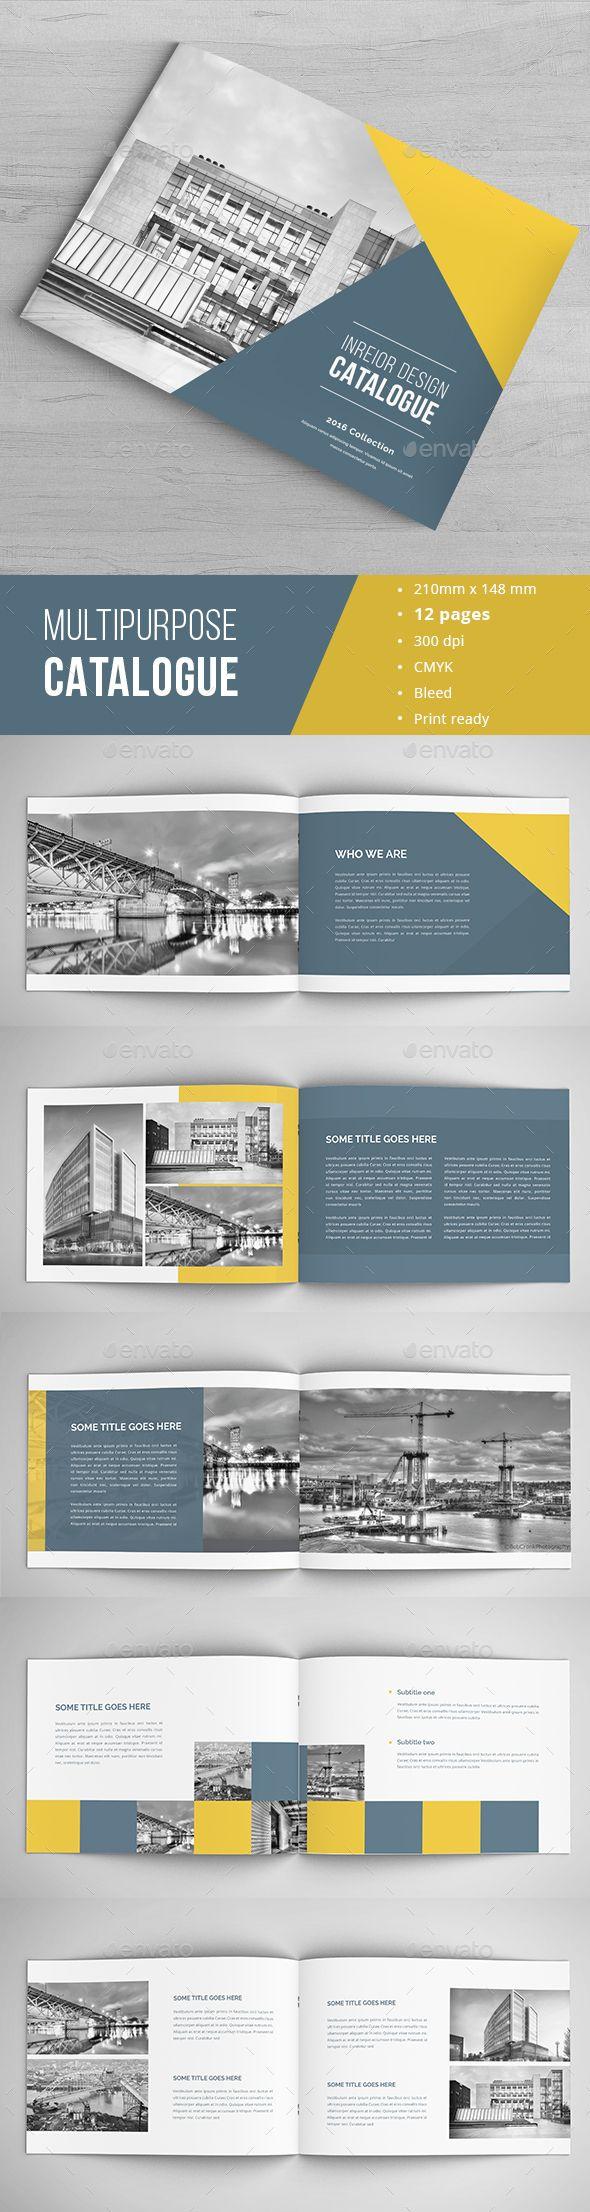 modern architecture brochure template indesign indd download here. Black Bedroom Furniture Sets. Home Design Ideas